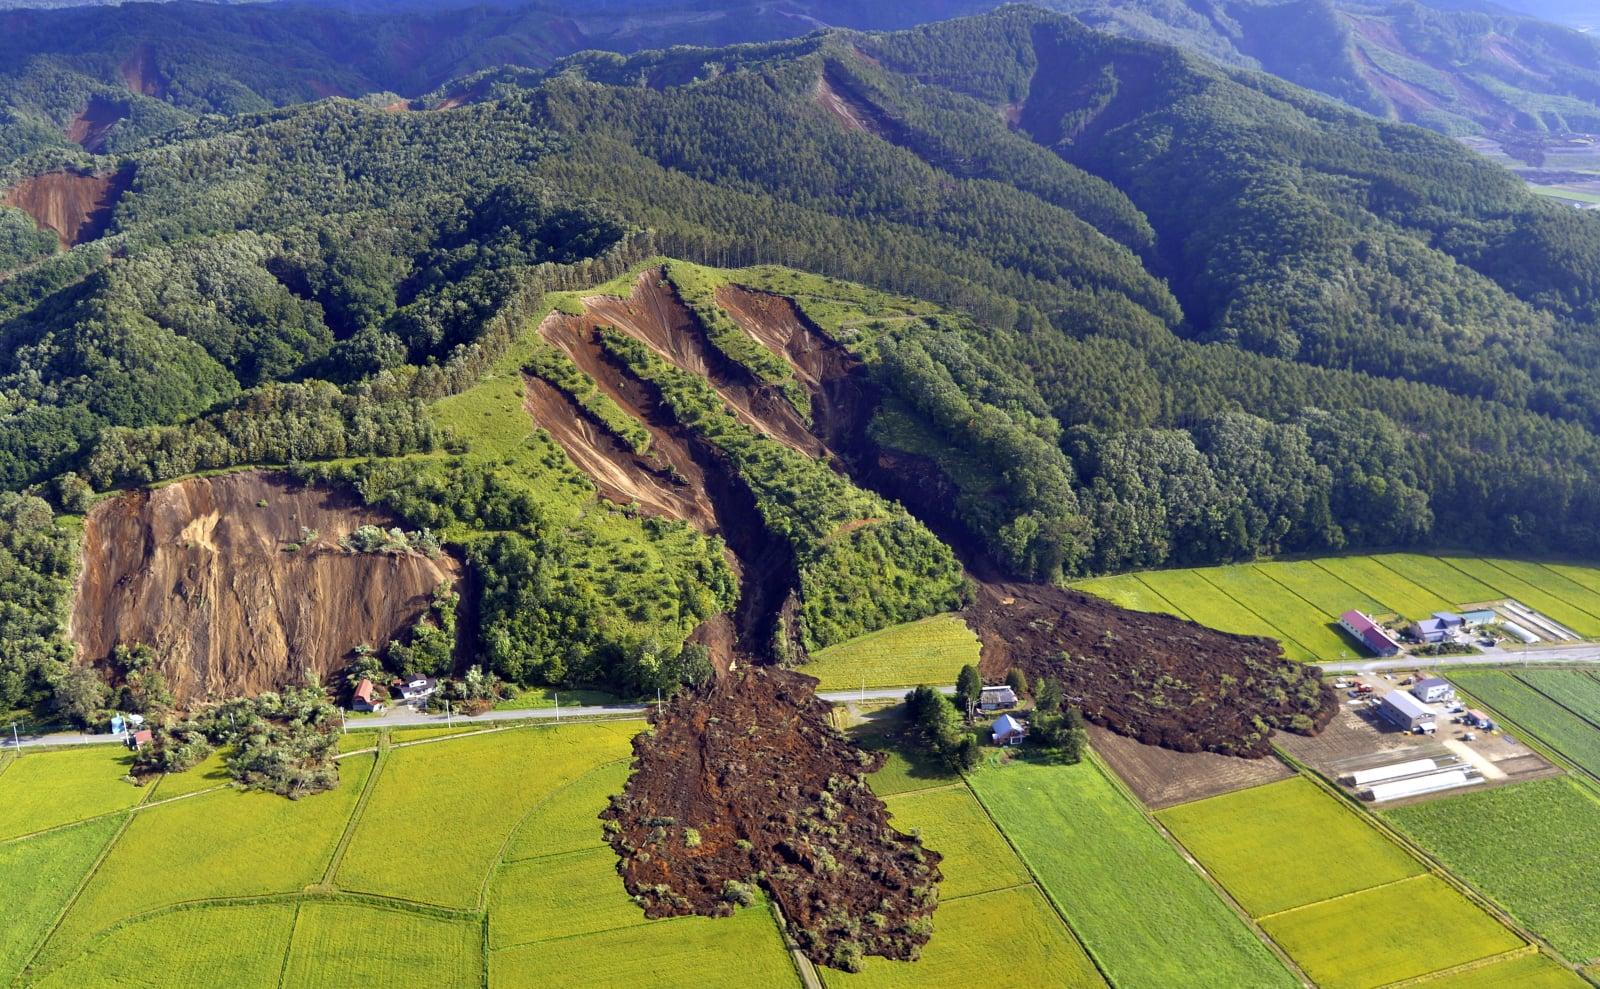 EPA/JIJI PRESS JAPAN